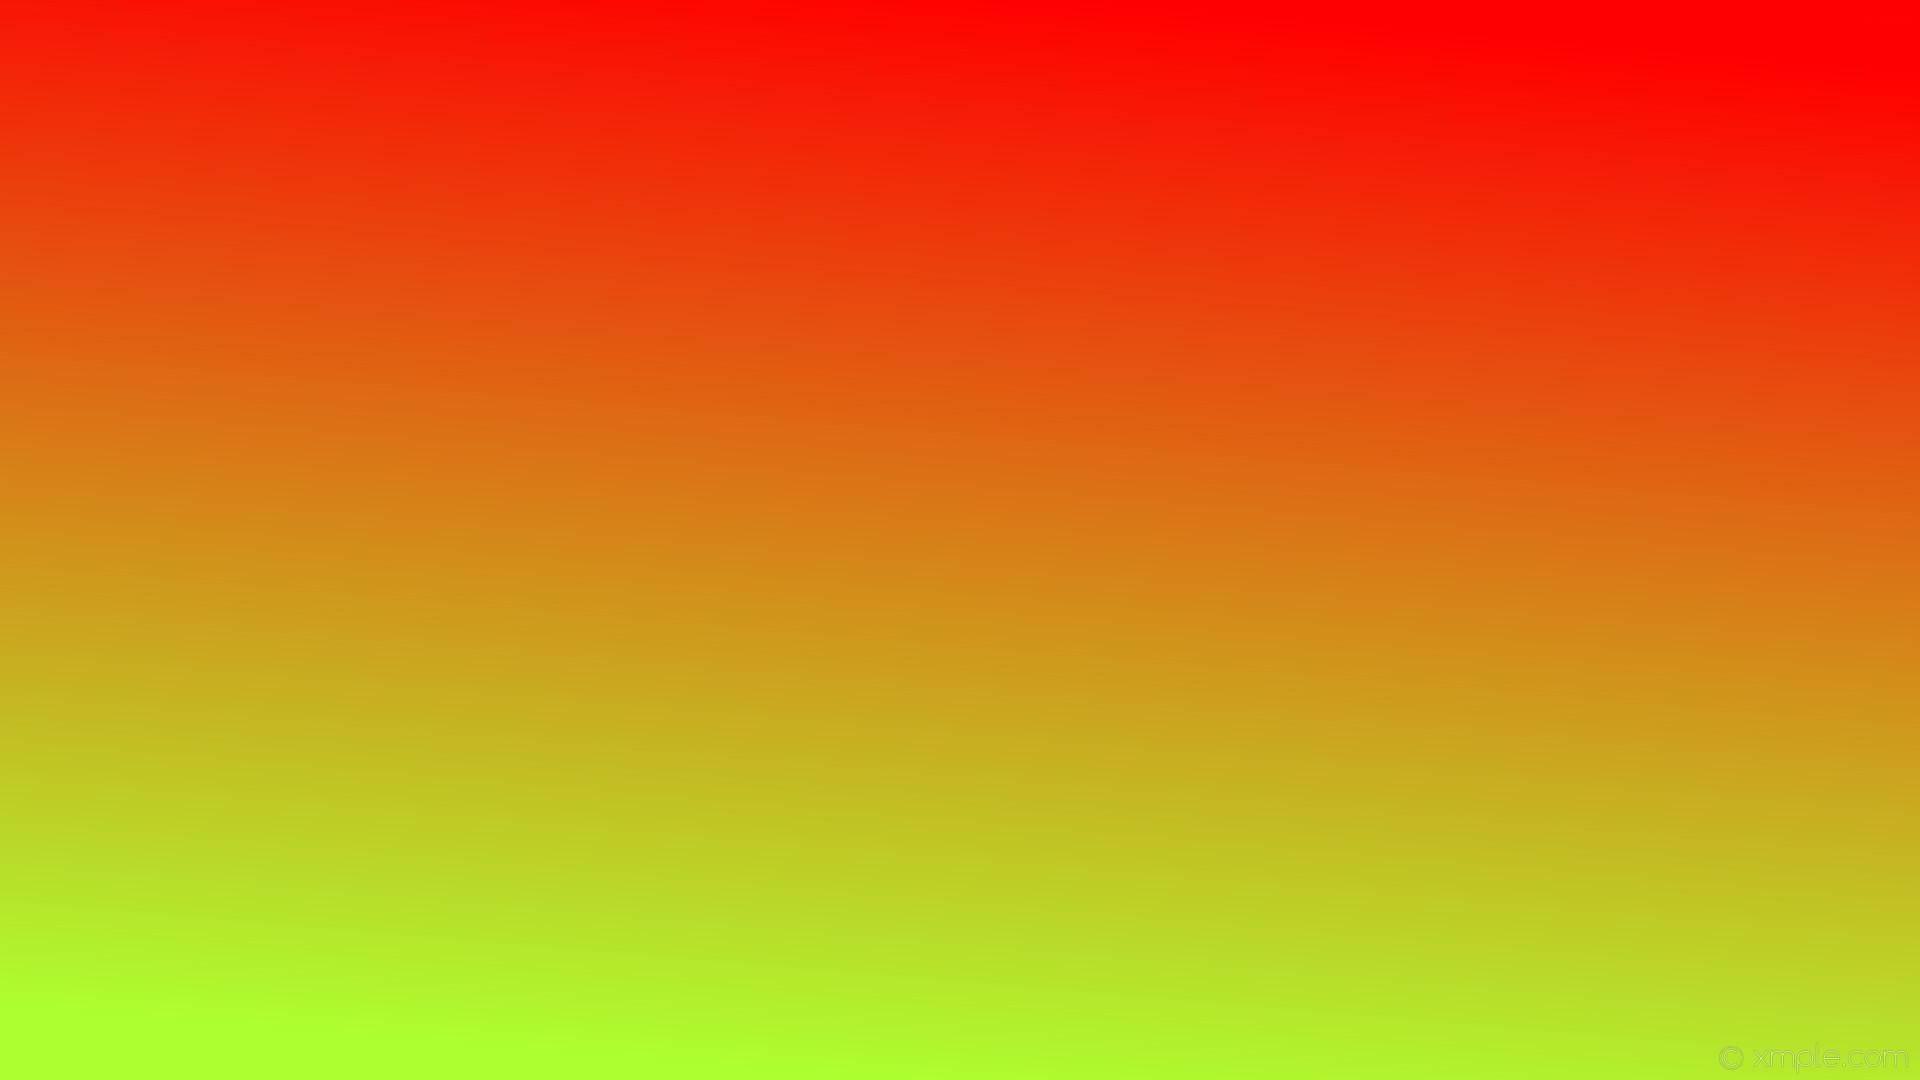 wallpaper gradient linear green red green yellow #adff2f #ff0000 255°